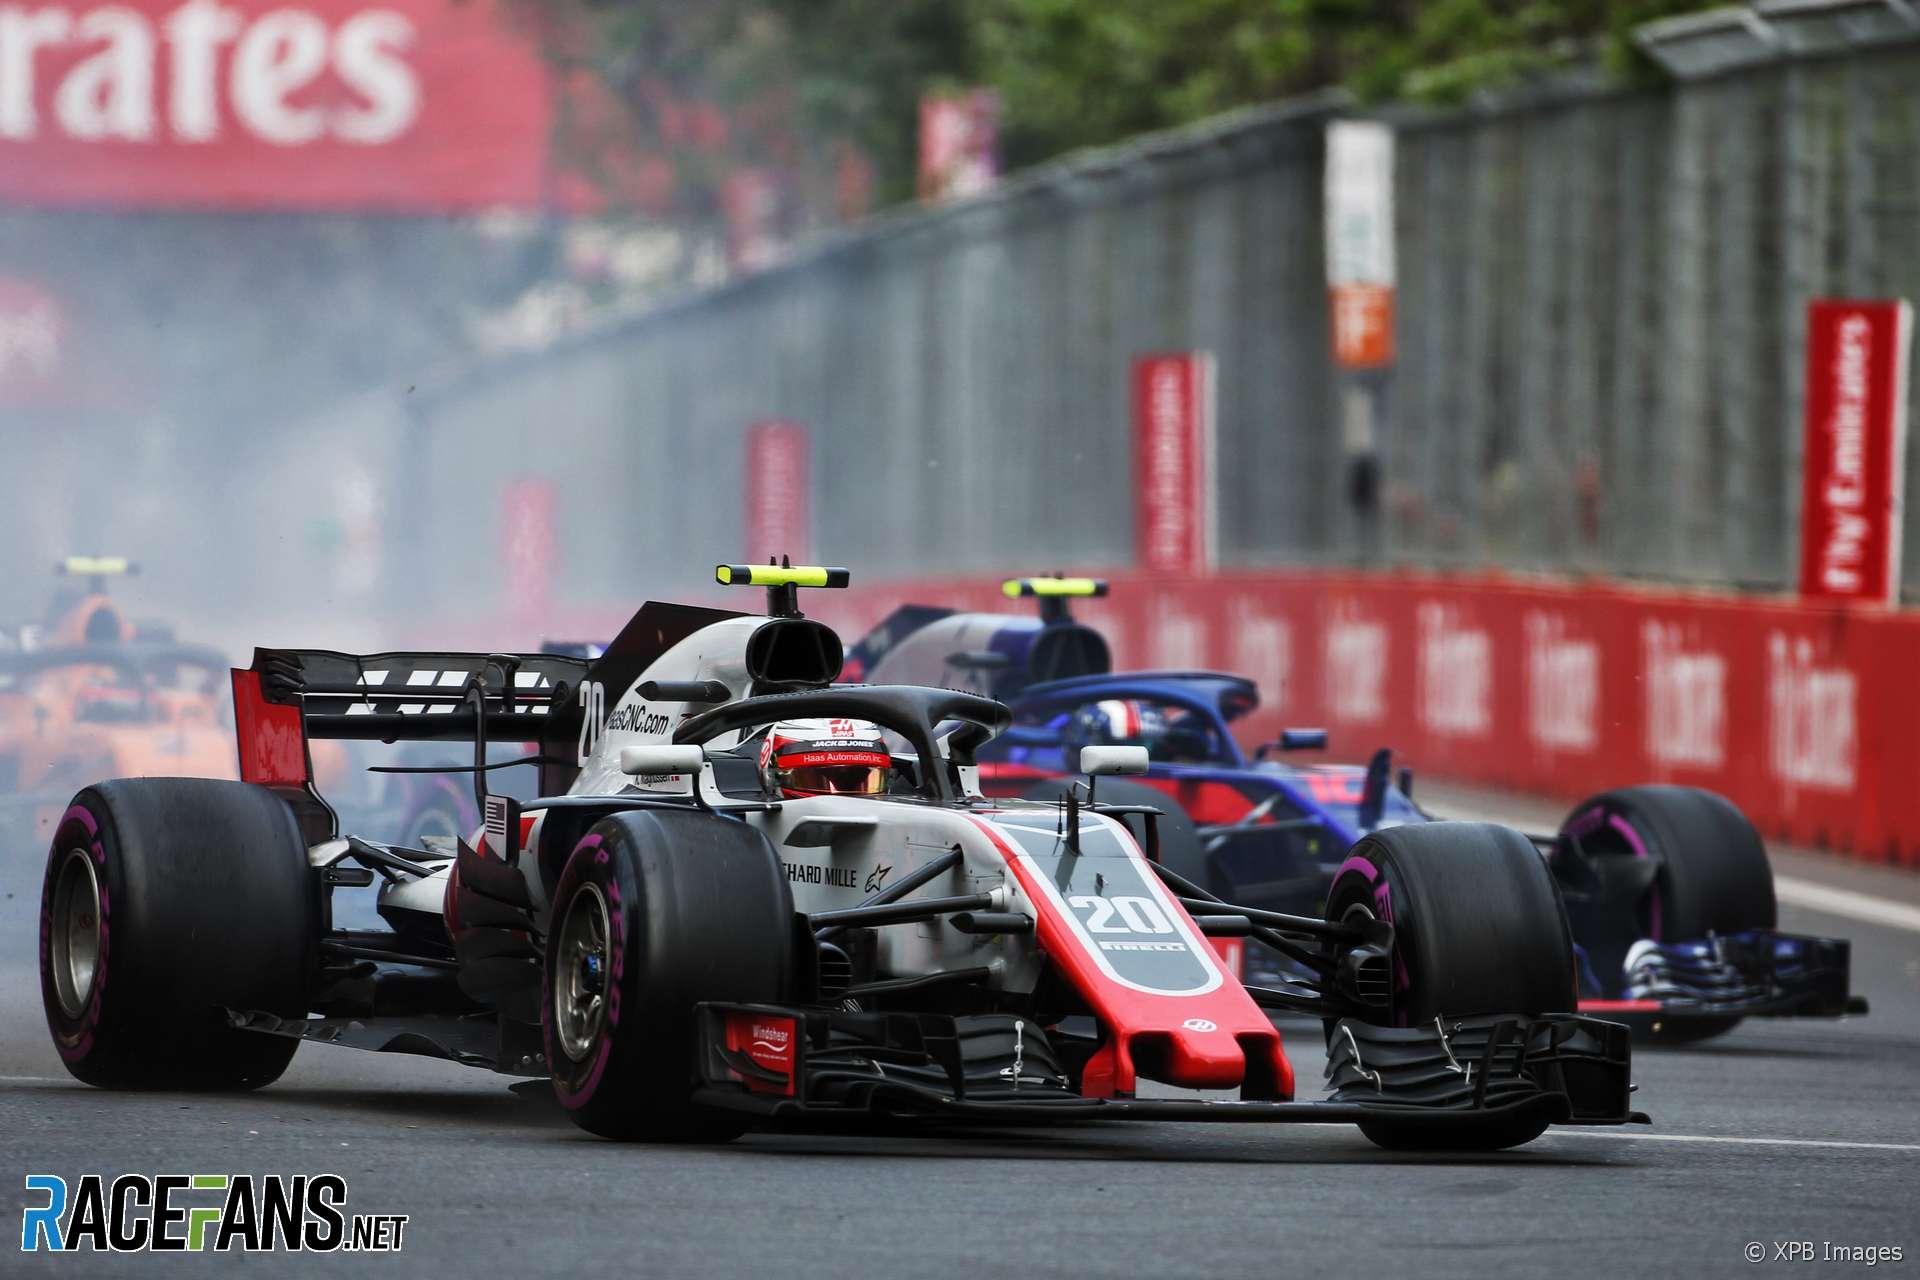 Kevin Magnussen, Haas, Baku City Circuit, 2018